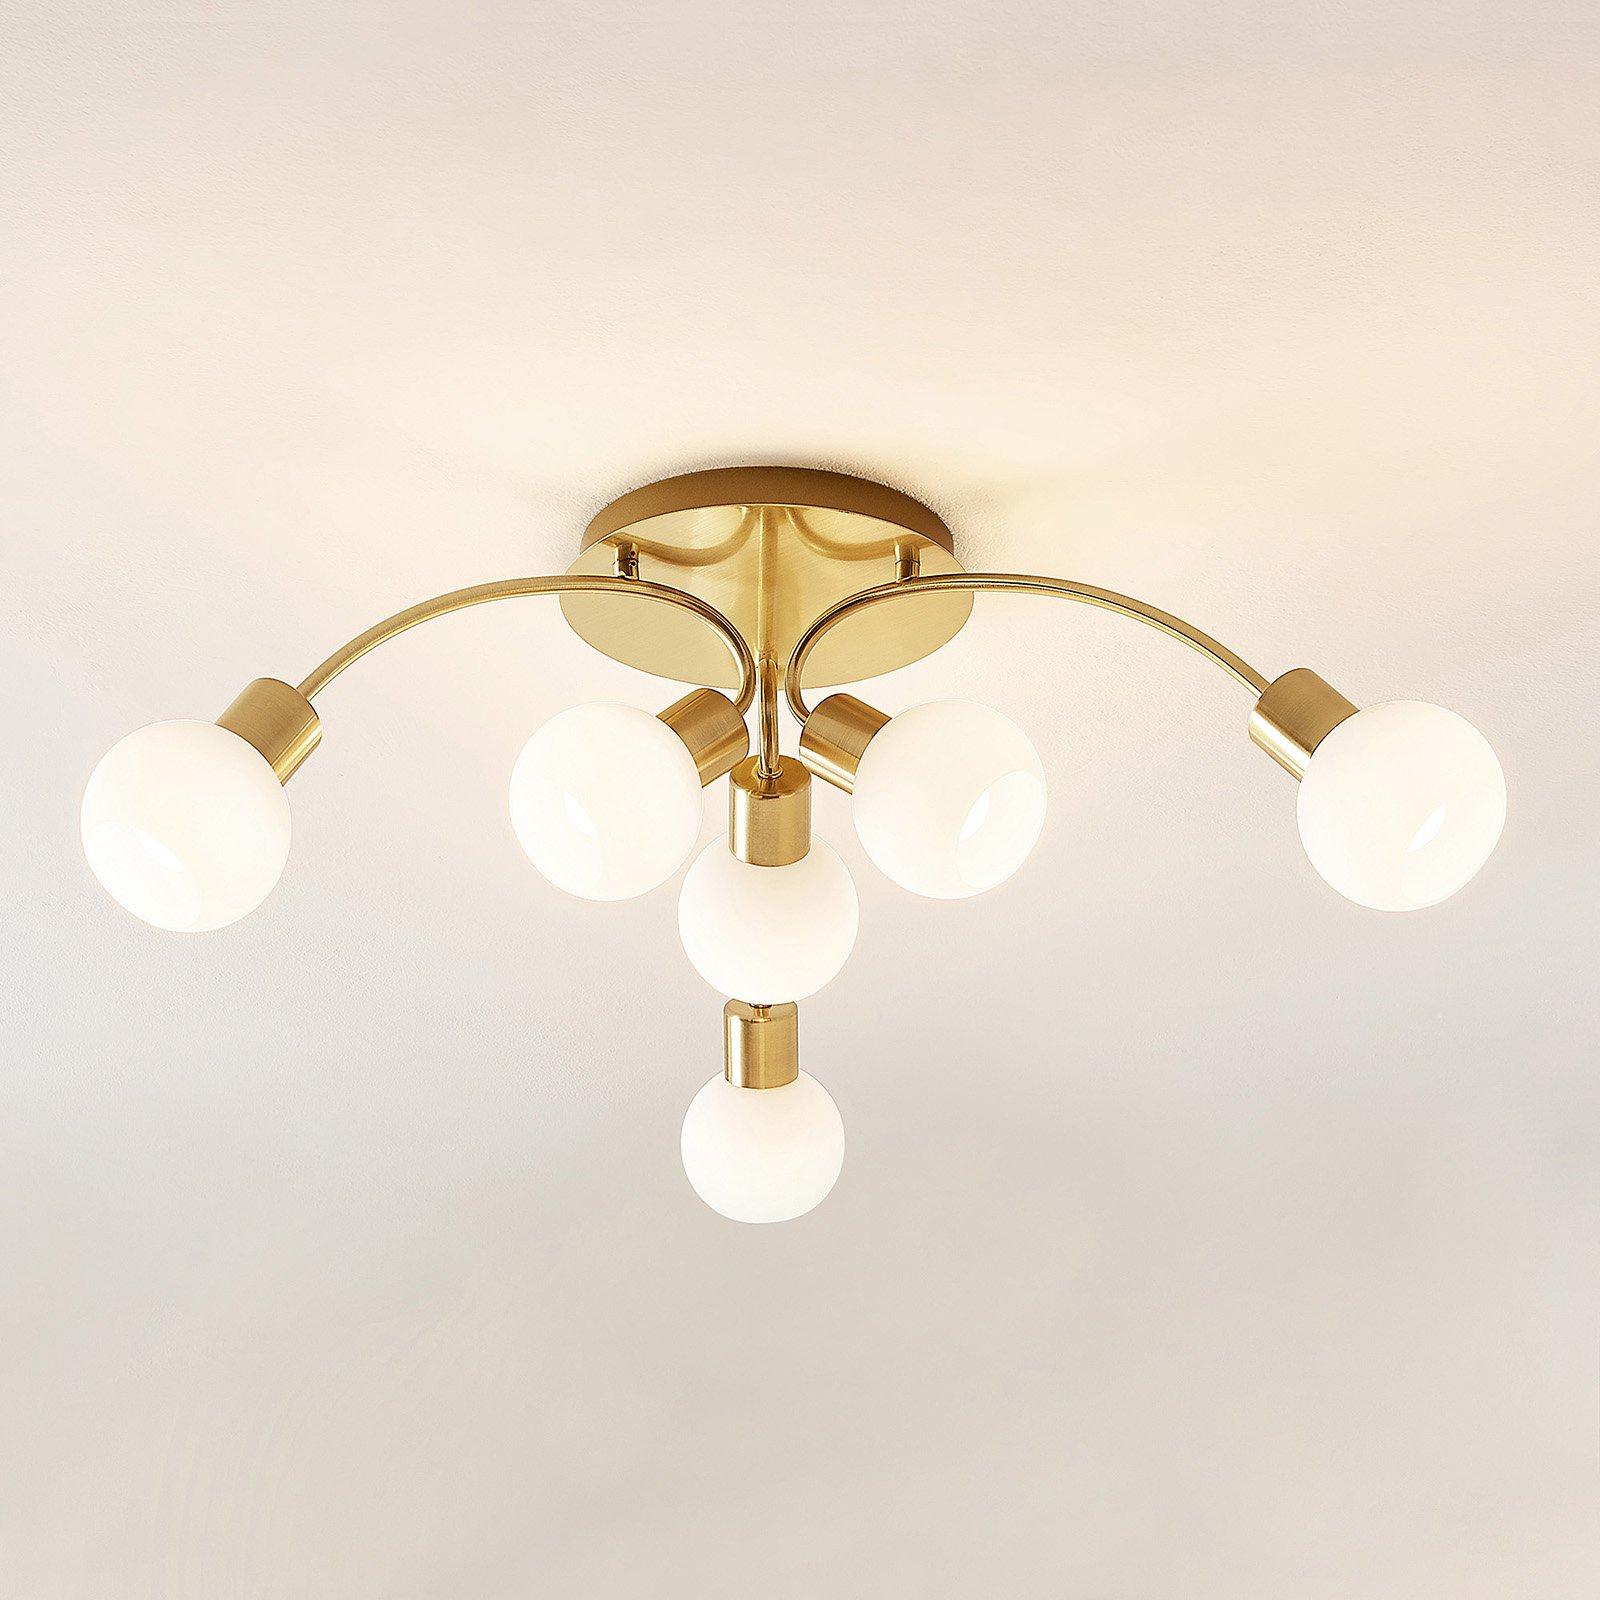 Lindby Tancerdi LED-taklampe i messing